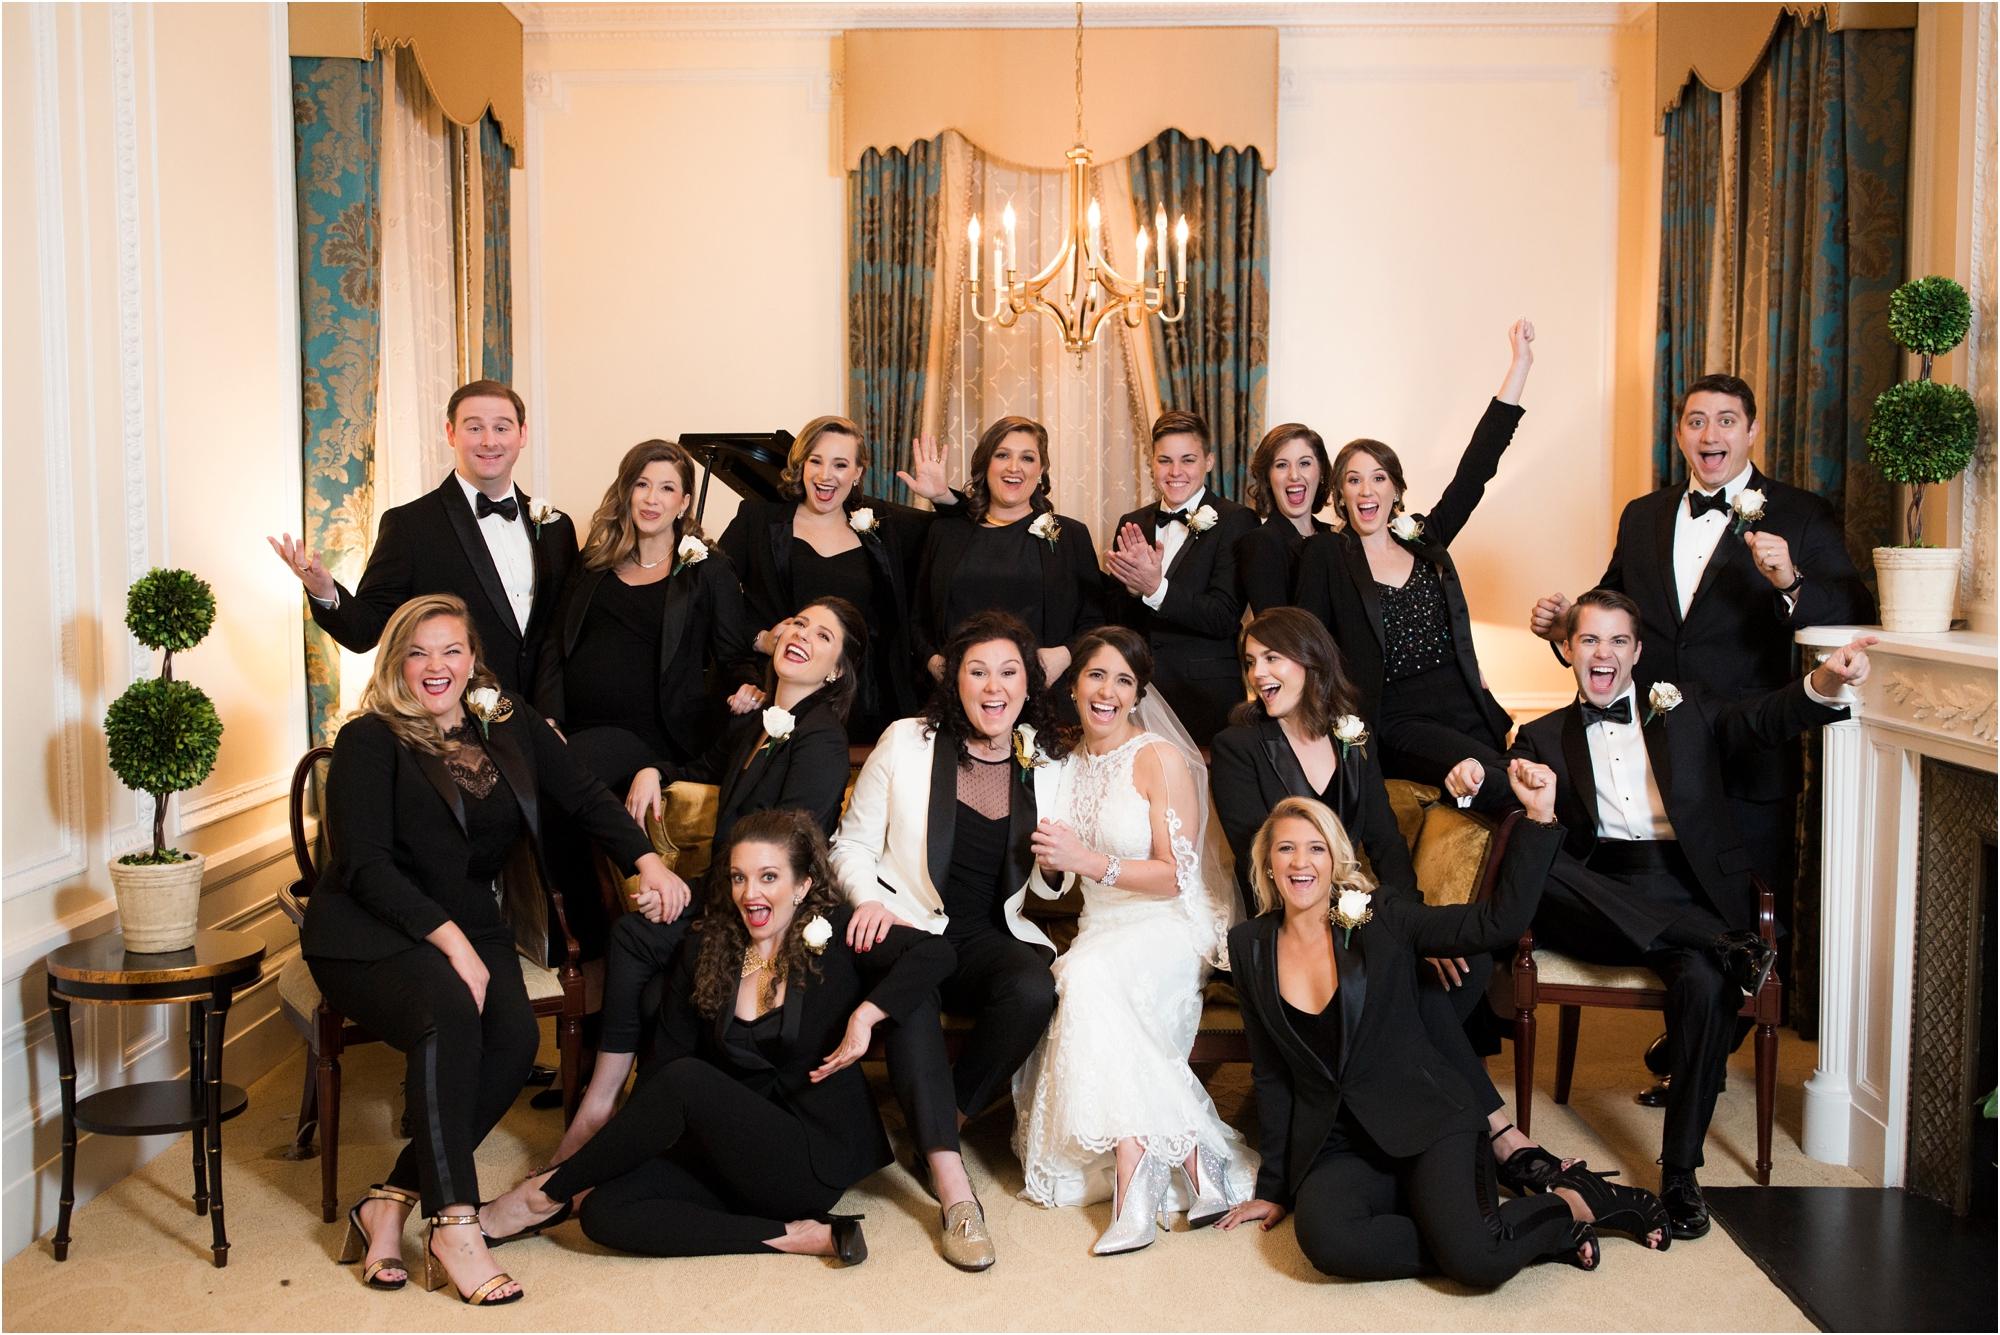 phoebe-mayme-richmond-virginia-colorful-love-is-love-wedding-photos_0011.jpg